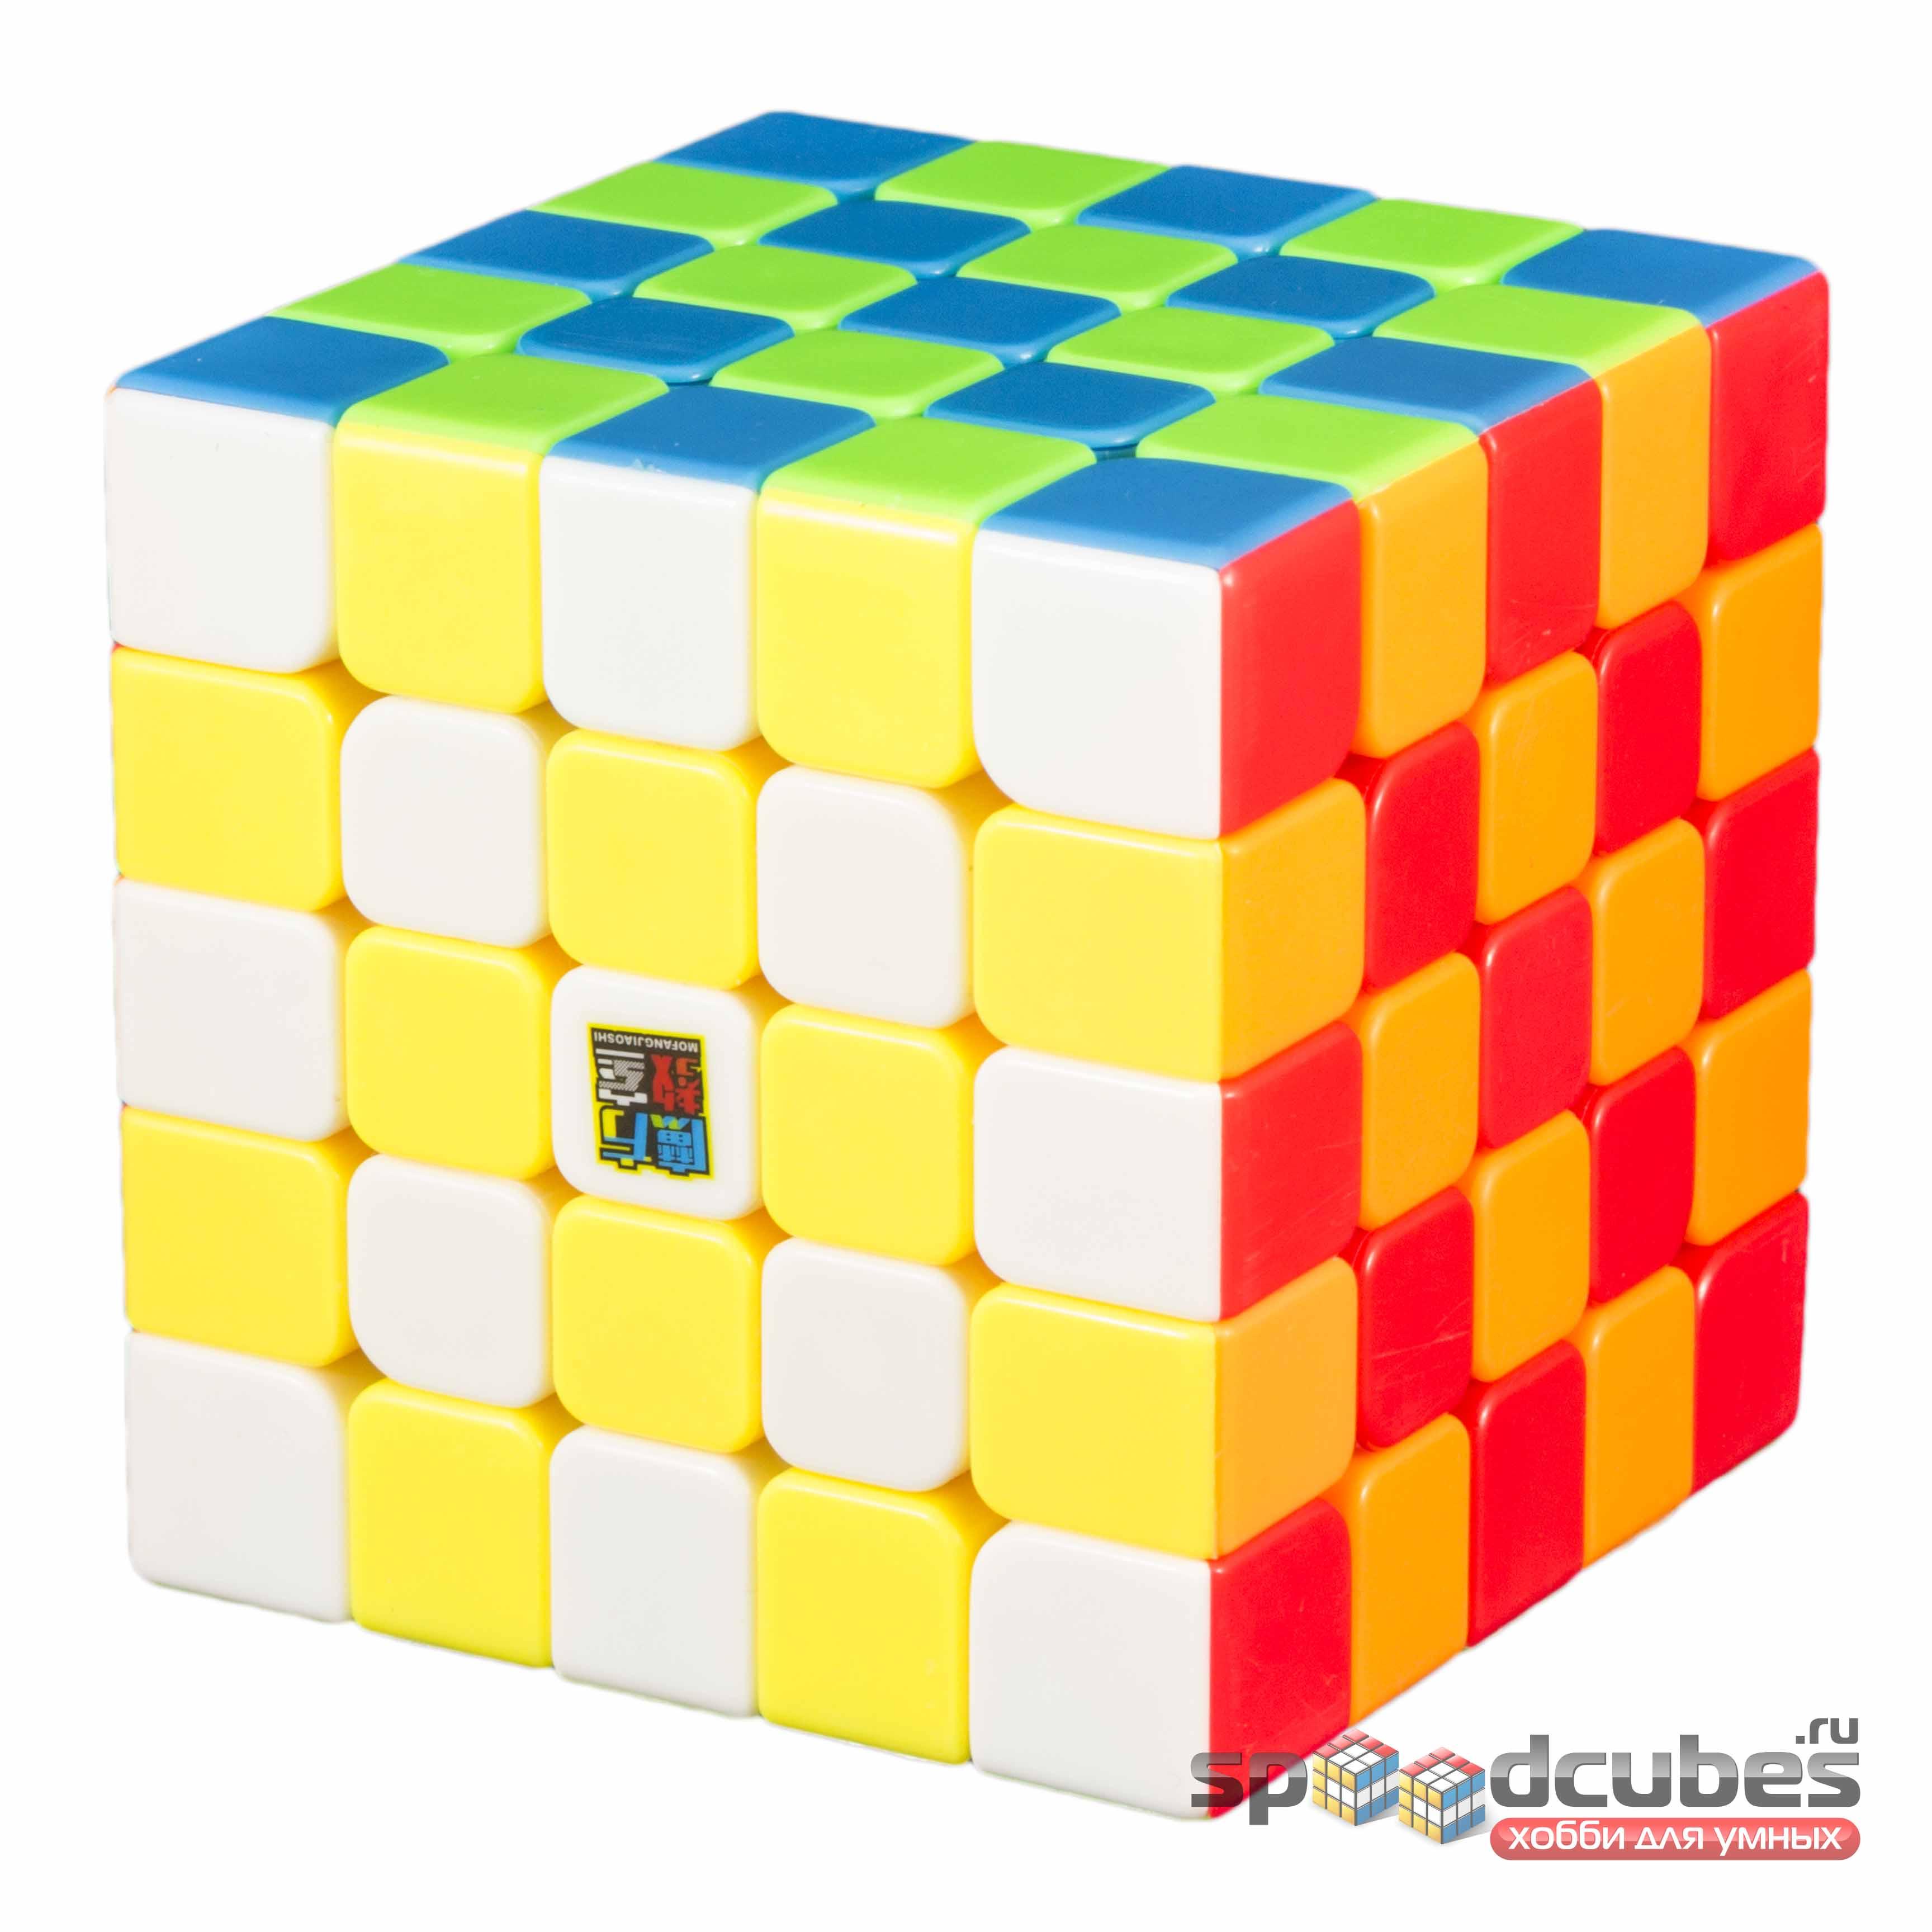 MoYu Cubing Classroom (набор Moyu MF2s, MF3rs, MF4s, MF5s) 6